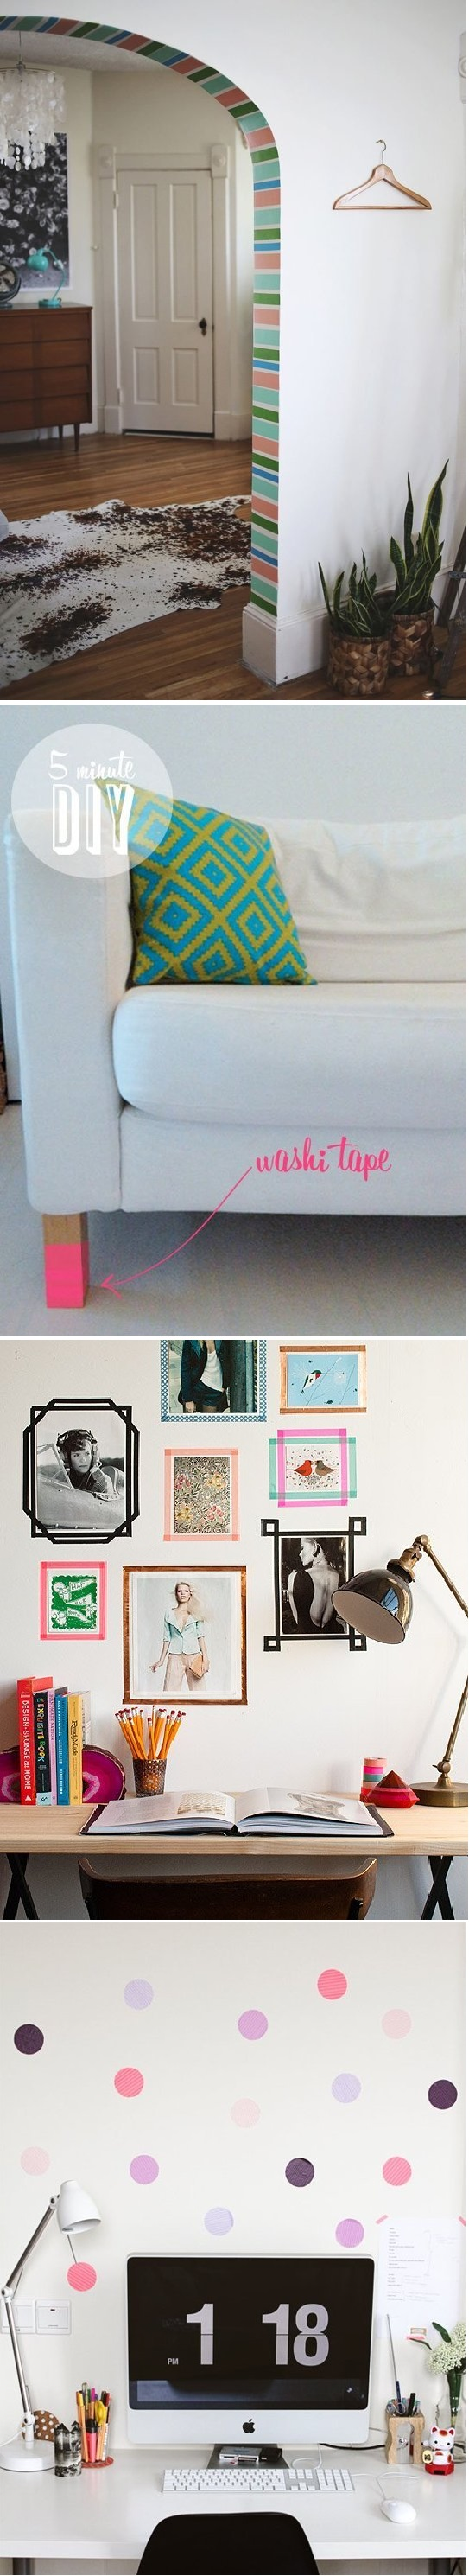 Washi tape na decoração 3